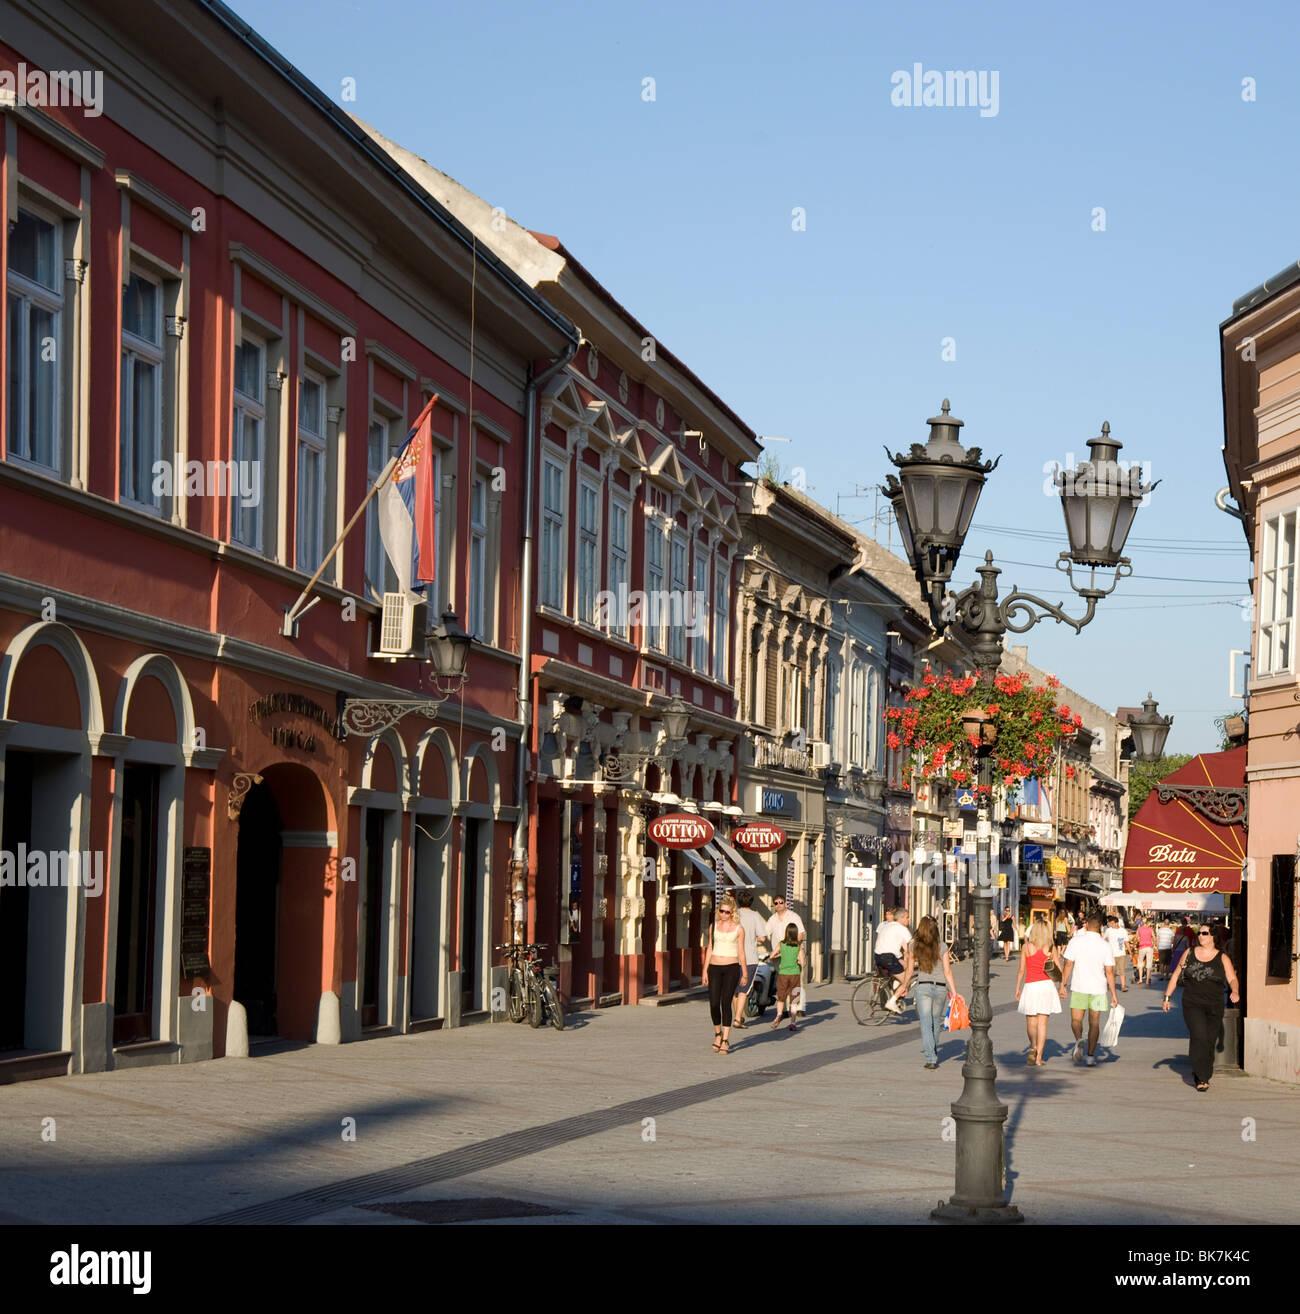 Dunavska Street, a pedestrianized area in the old quarter of Novi Sad, Serbia, Europe - Stock Image